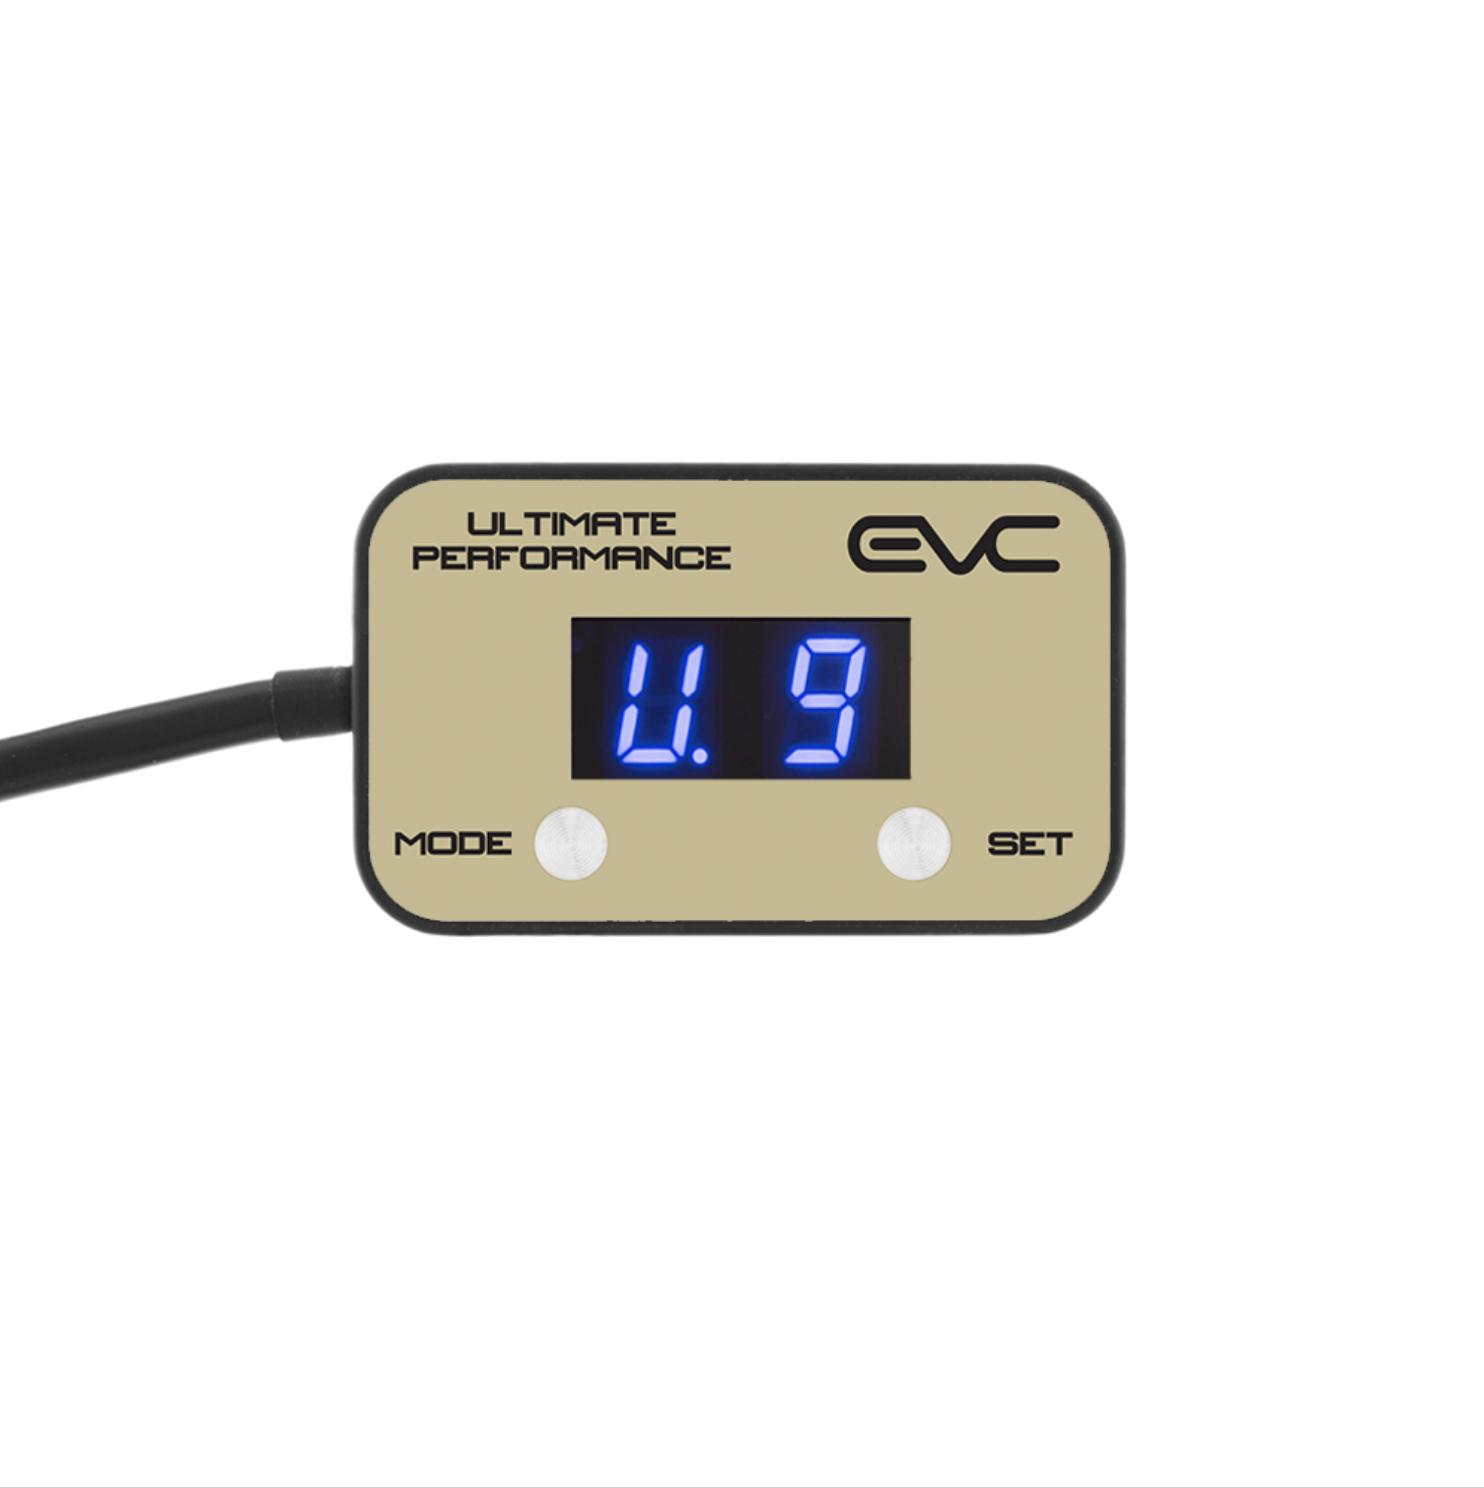 EVC iDrive Throttle Controller sandy for Fiat Linea Lhd 2007 EVC319